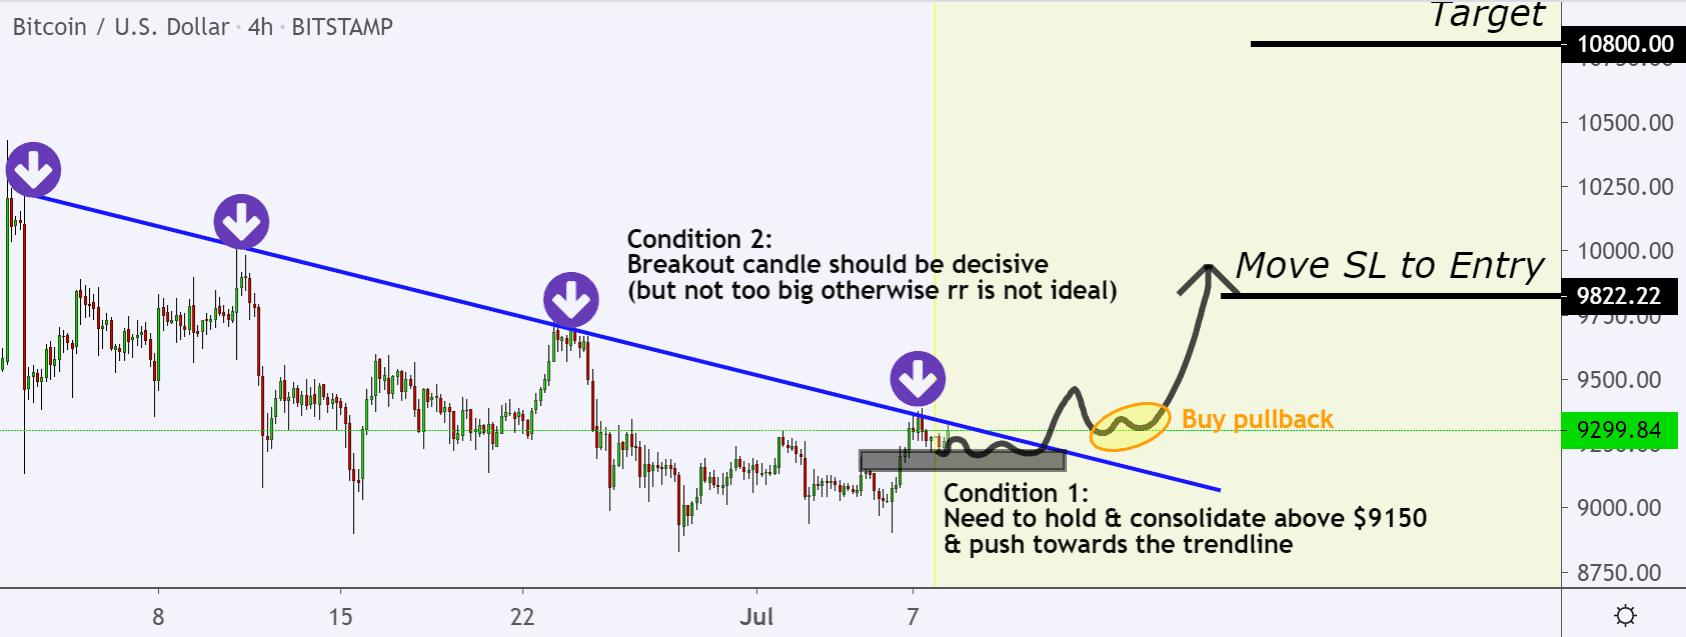 Bitcoin price chart 3 - 7 July